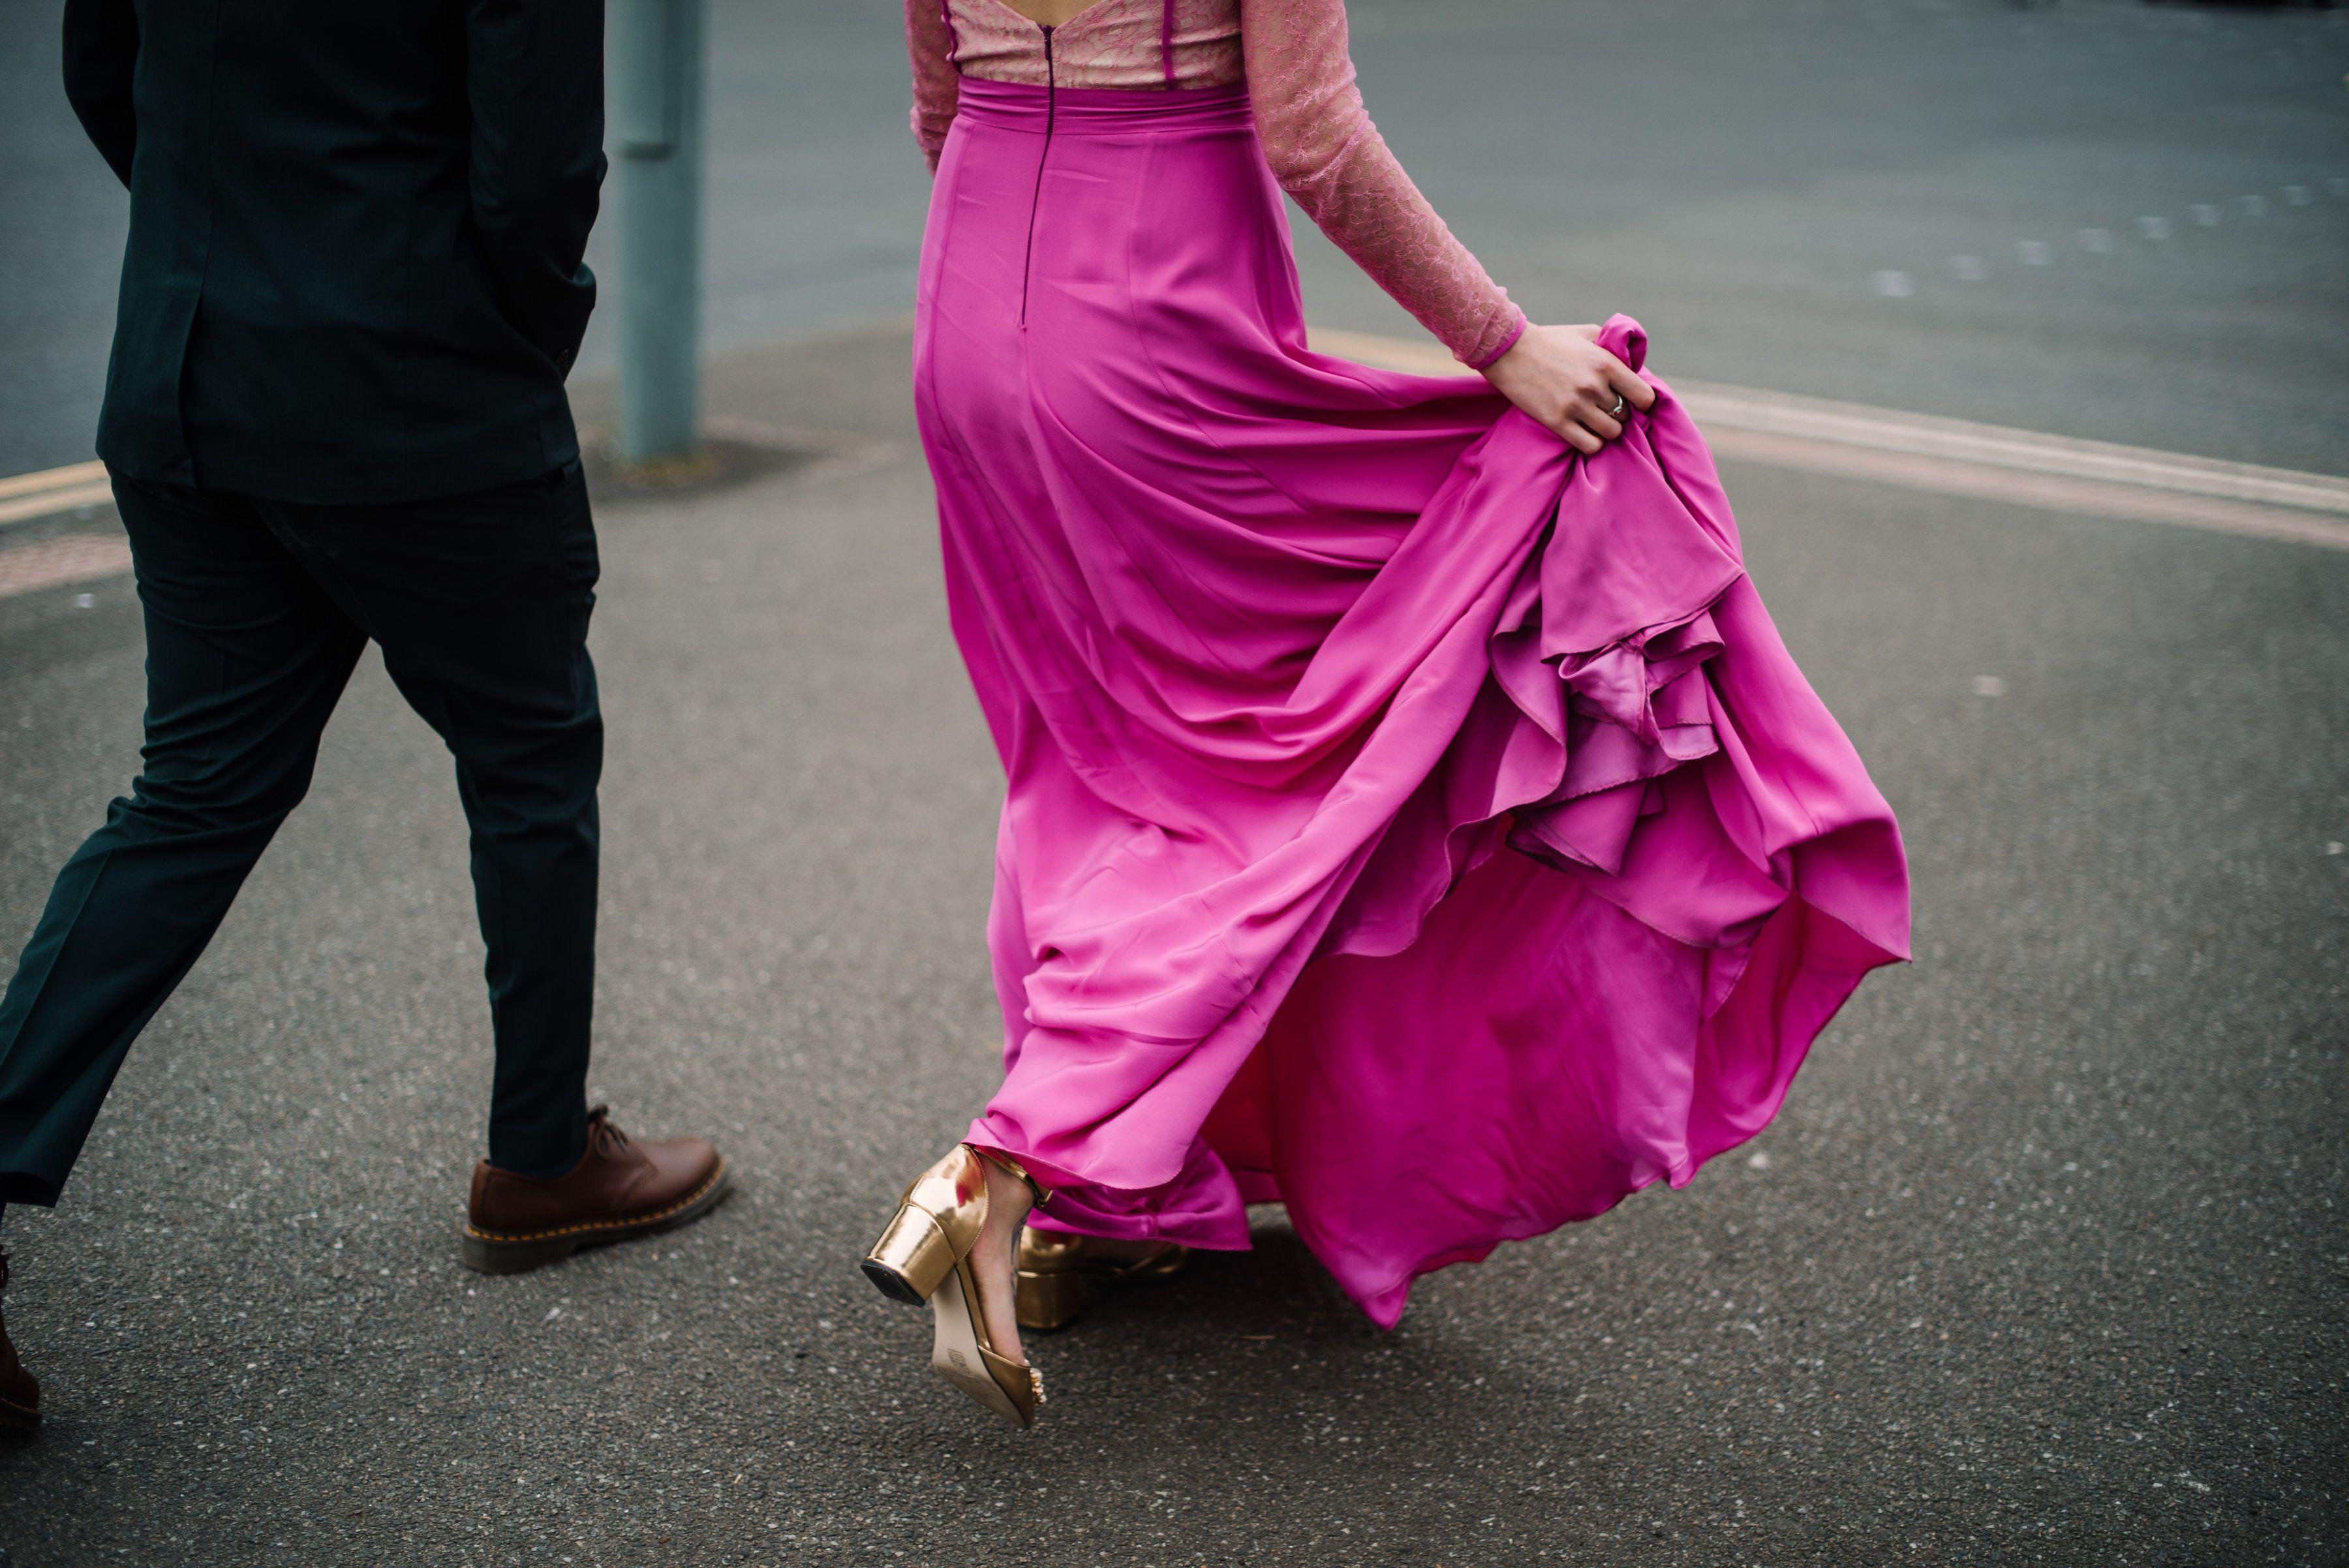 Caragh & Ryan 2016 Wedding // Claire Fleck Photography // The Glue ...